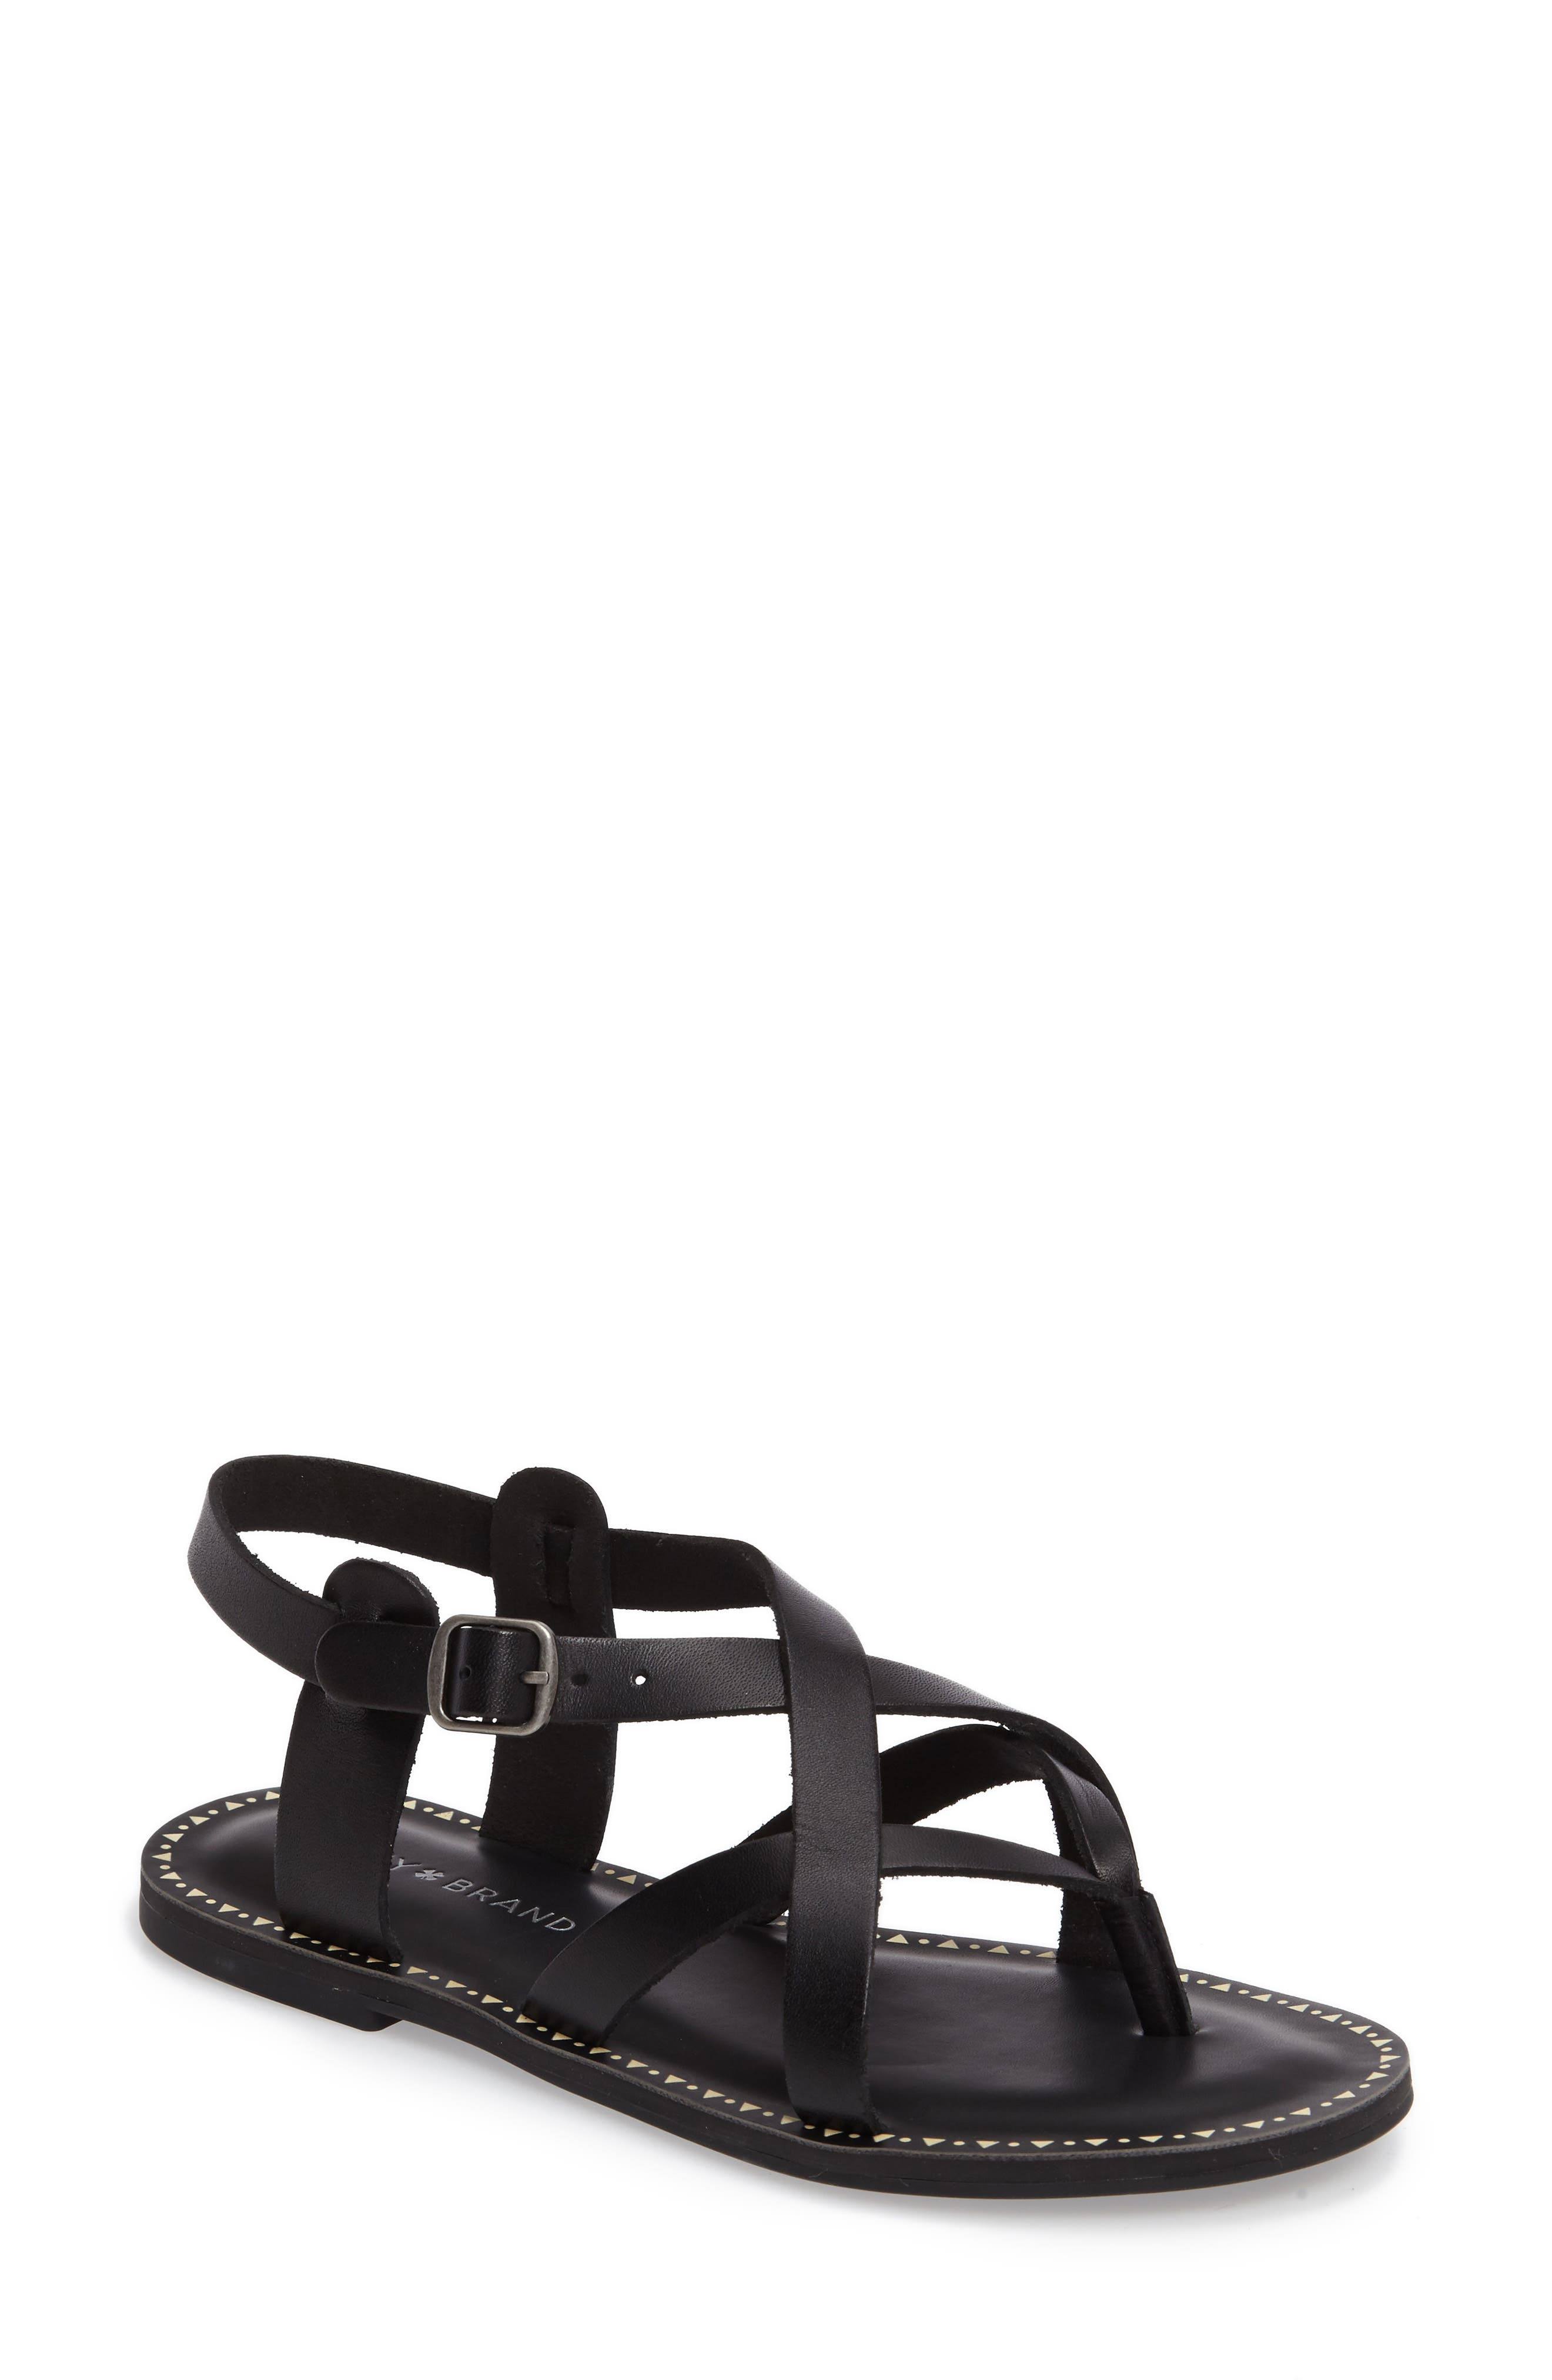 LUCKY BRAND Adinis Flat Sandal, Main, color, 001